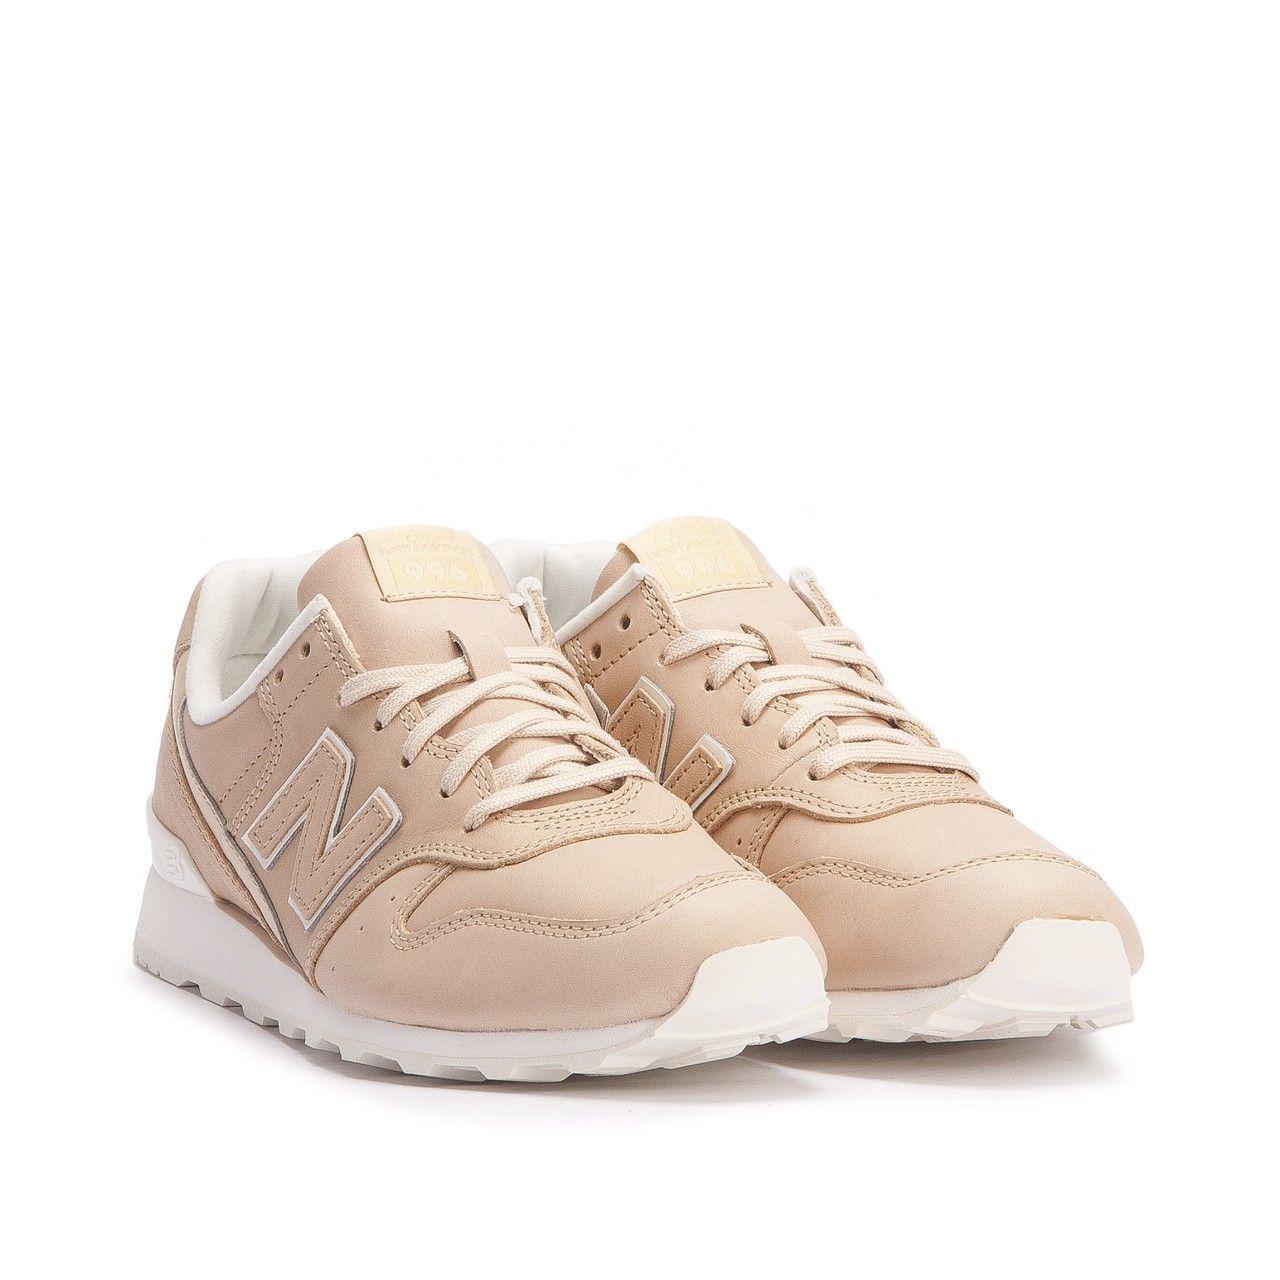 New Balance WR996 JT | New balance, Sneakers, Asics sneaker